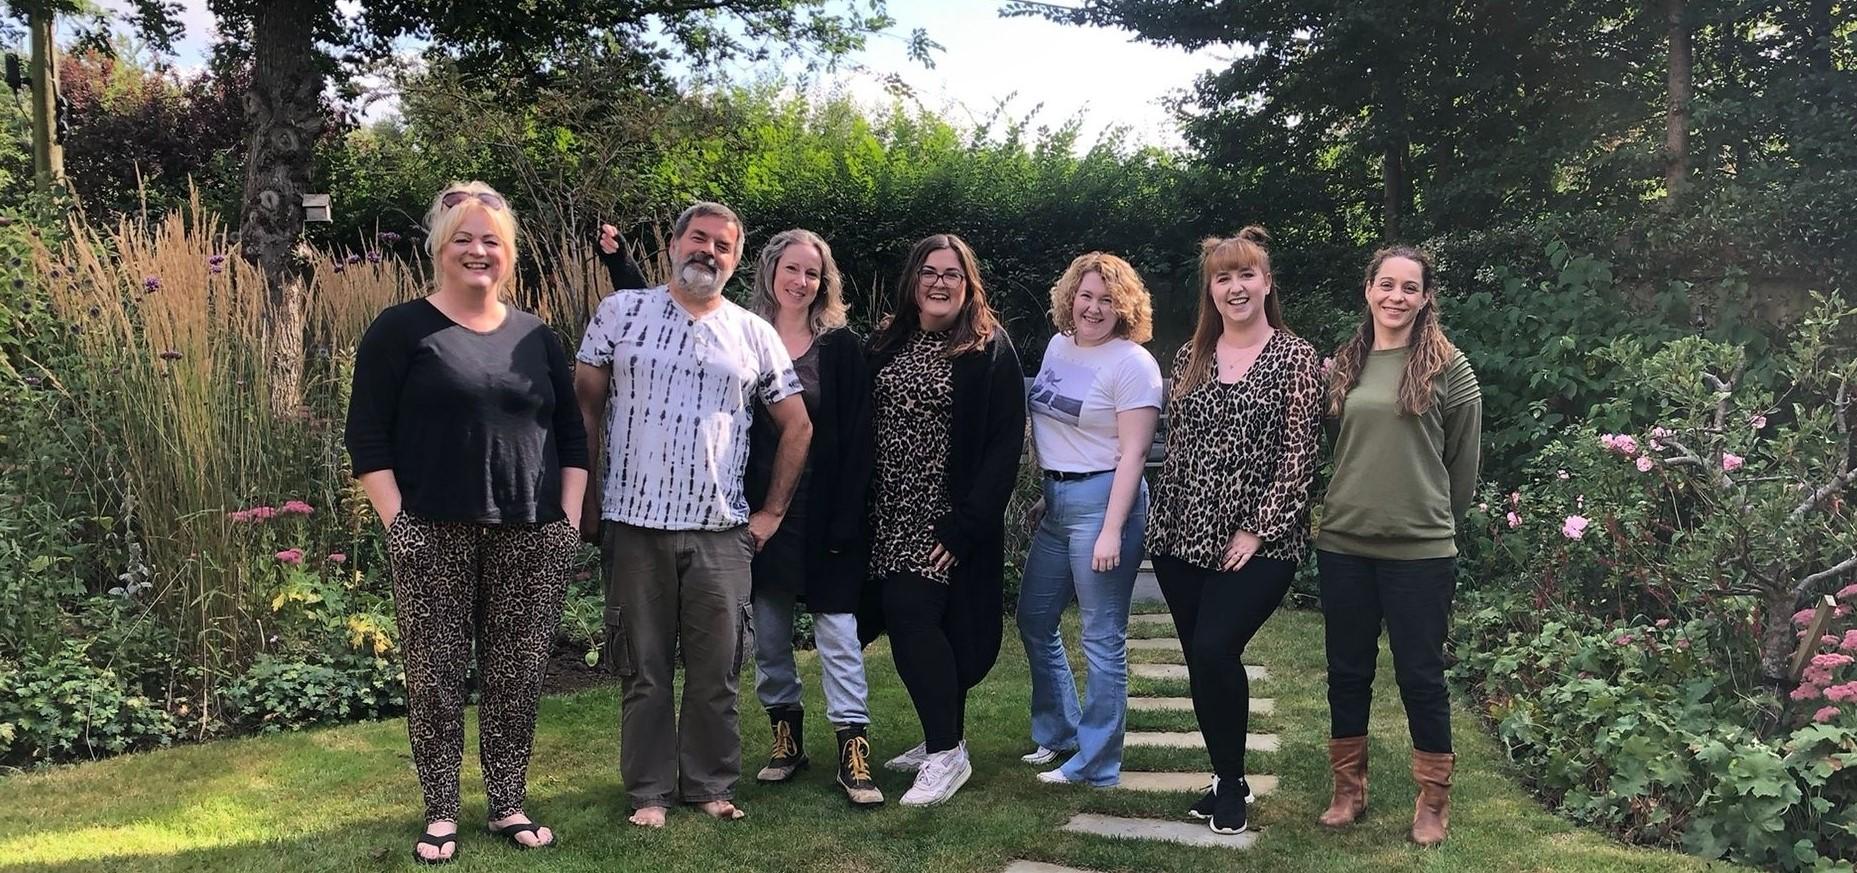 Team photo with Lois, KC, Jayne, Natasha, Vickie, Charlotte and Anne